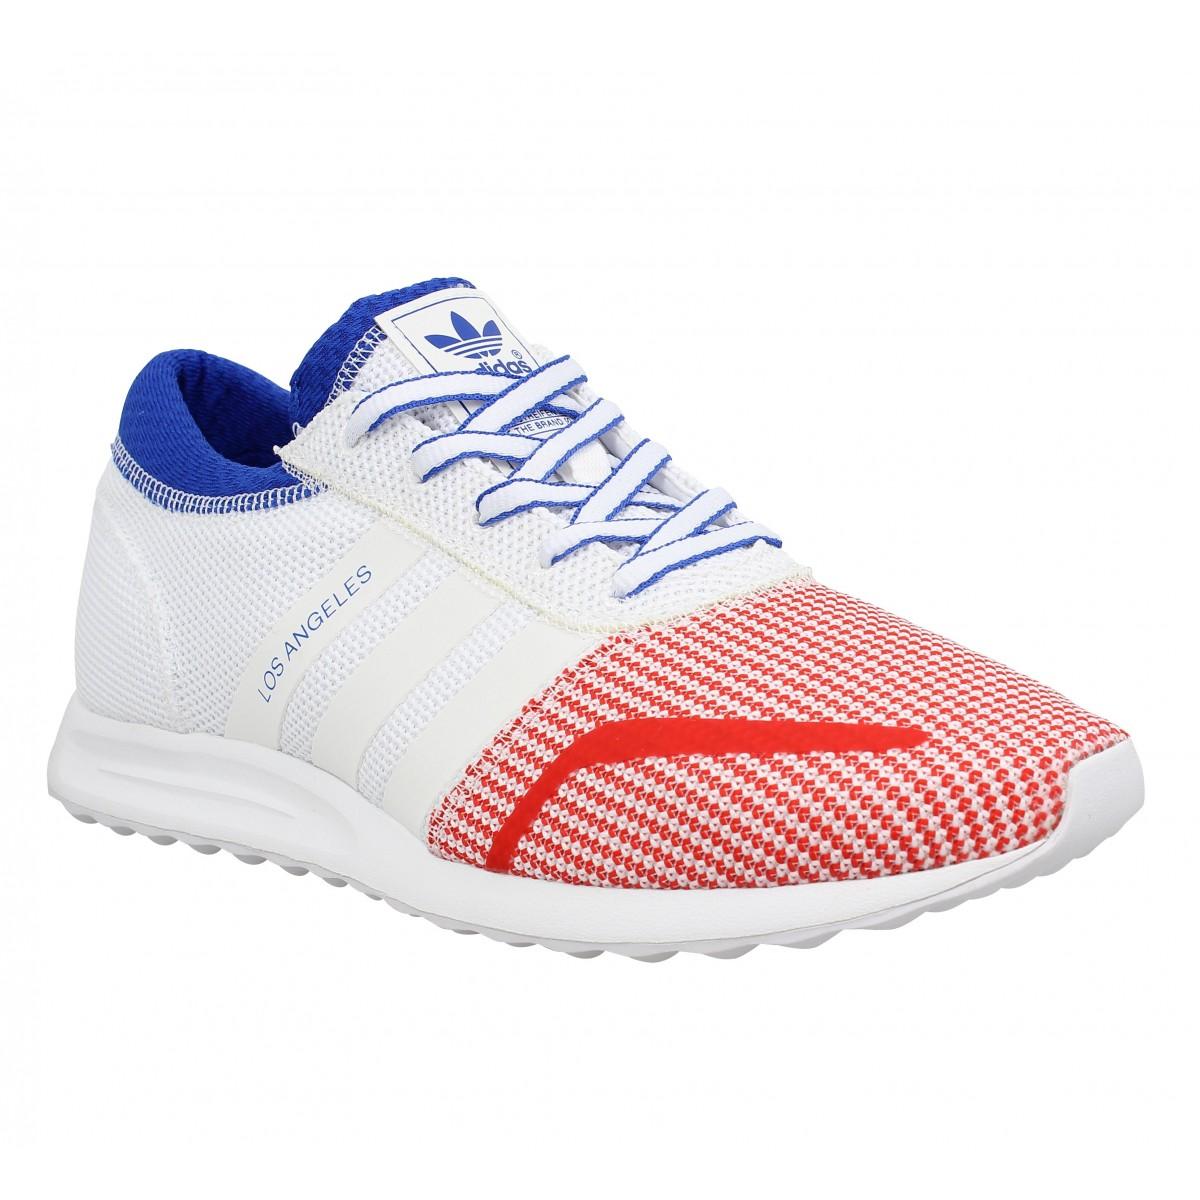 Bleu Blanc En Rouge Ligne Chaussure Adidas Avis 8nN0vmw